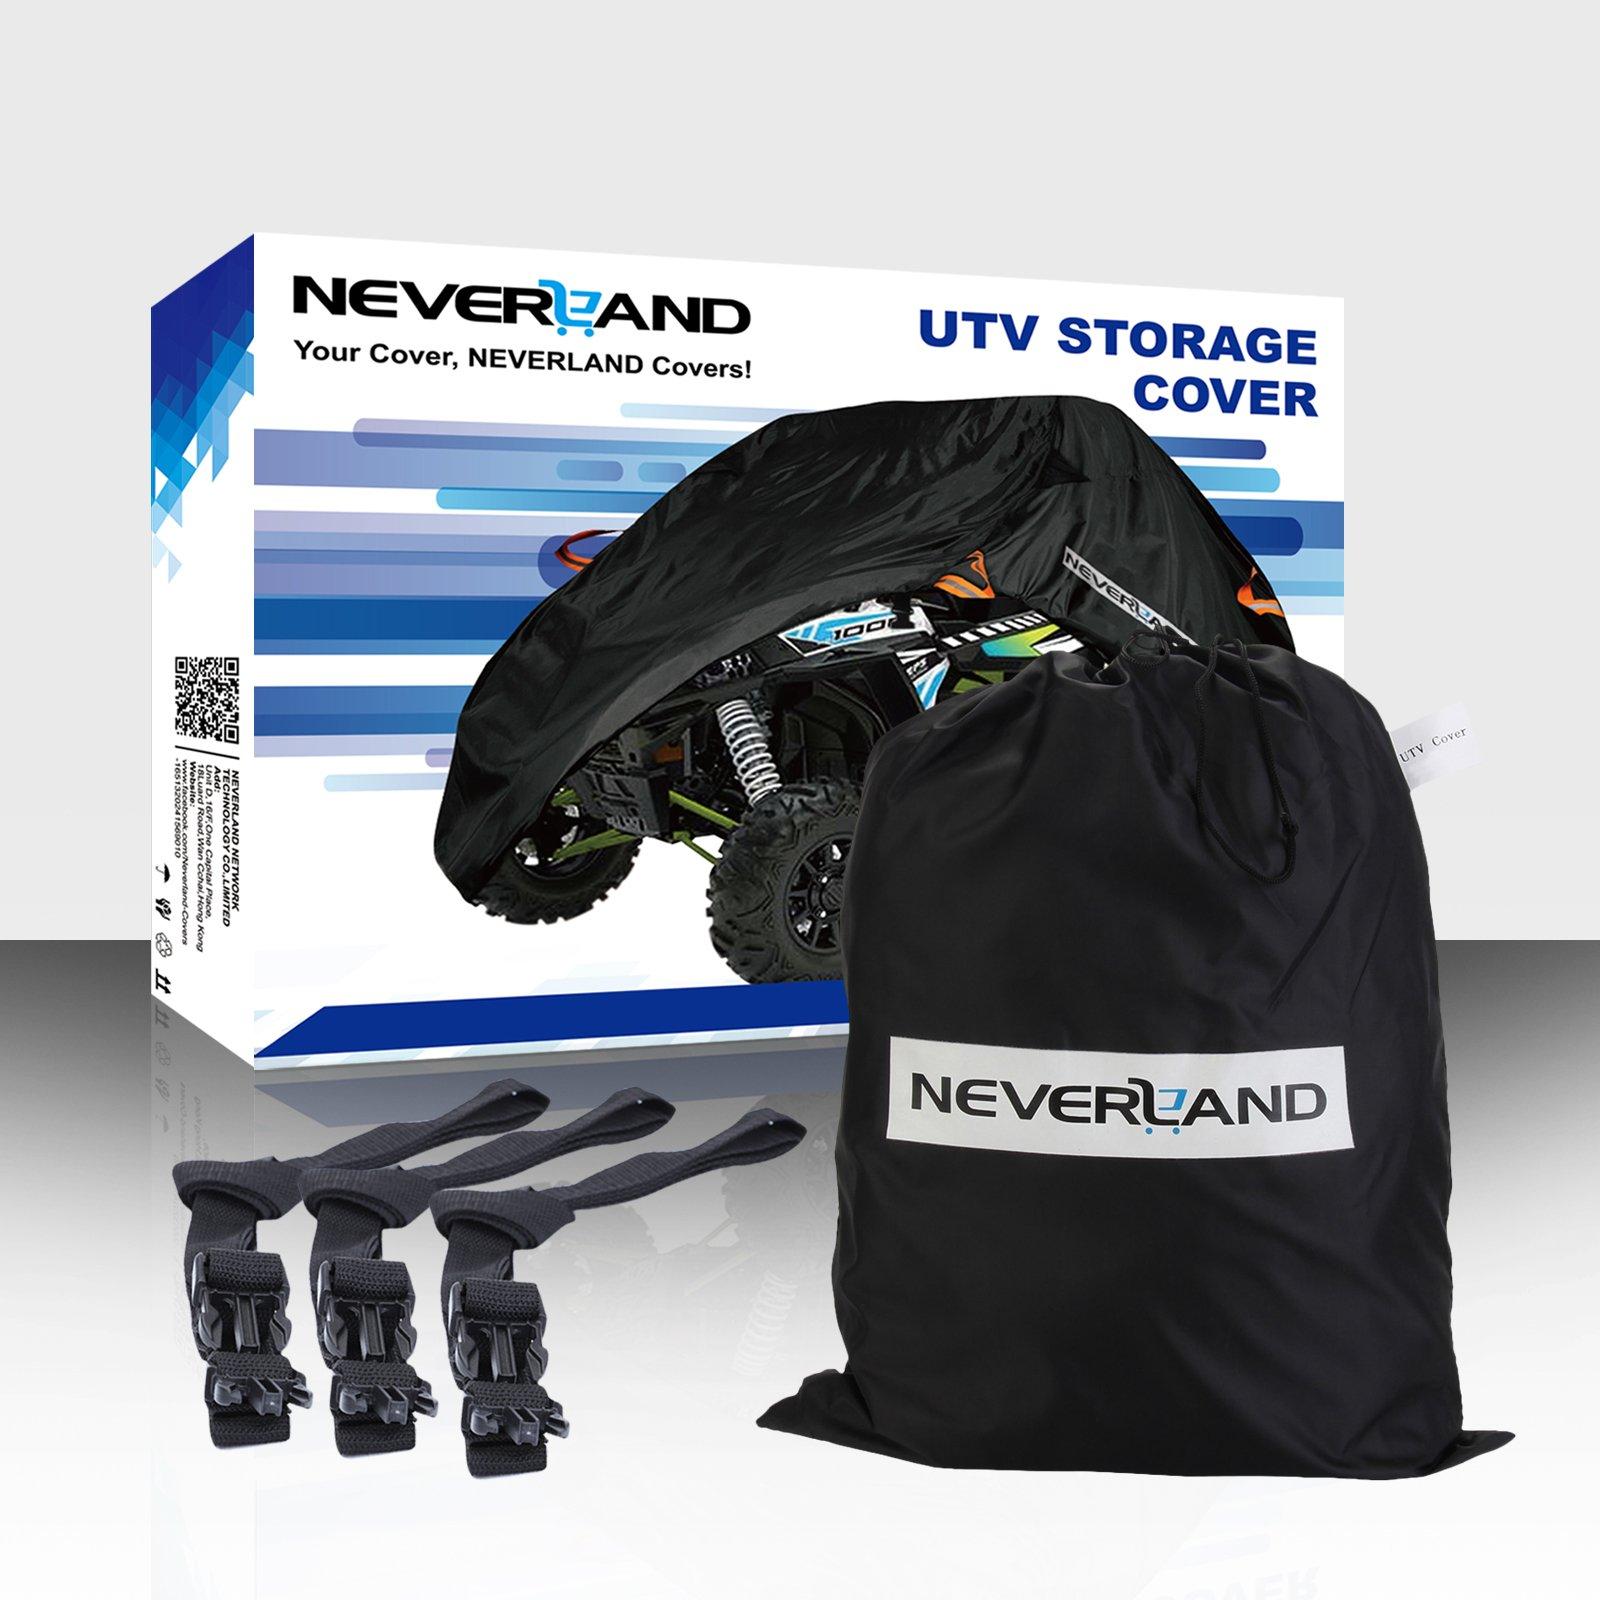 NEVERLAND UTV Cover,190T Waterproof Material for Polaris Ranger Yamaha WOLVERINE Honda Kawasaki Teryx Textron Off Road Wildcat 2-3 Passenger by NEVERLAND (Image #9)